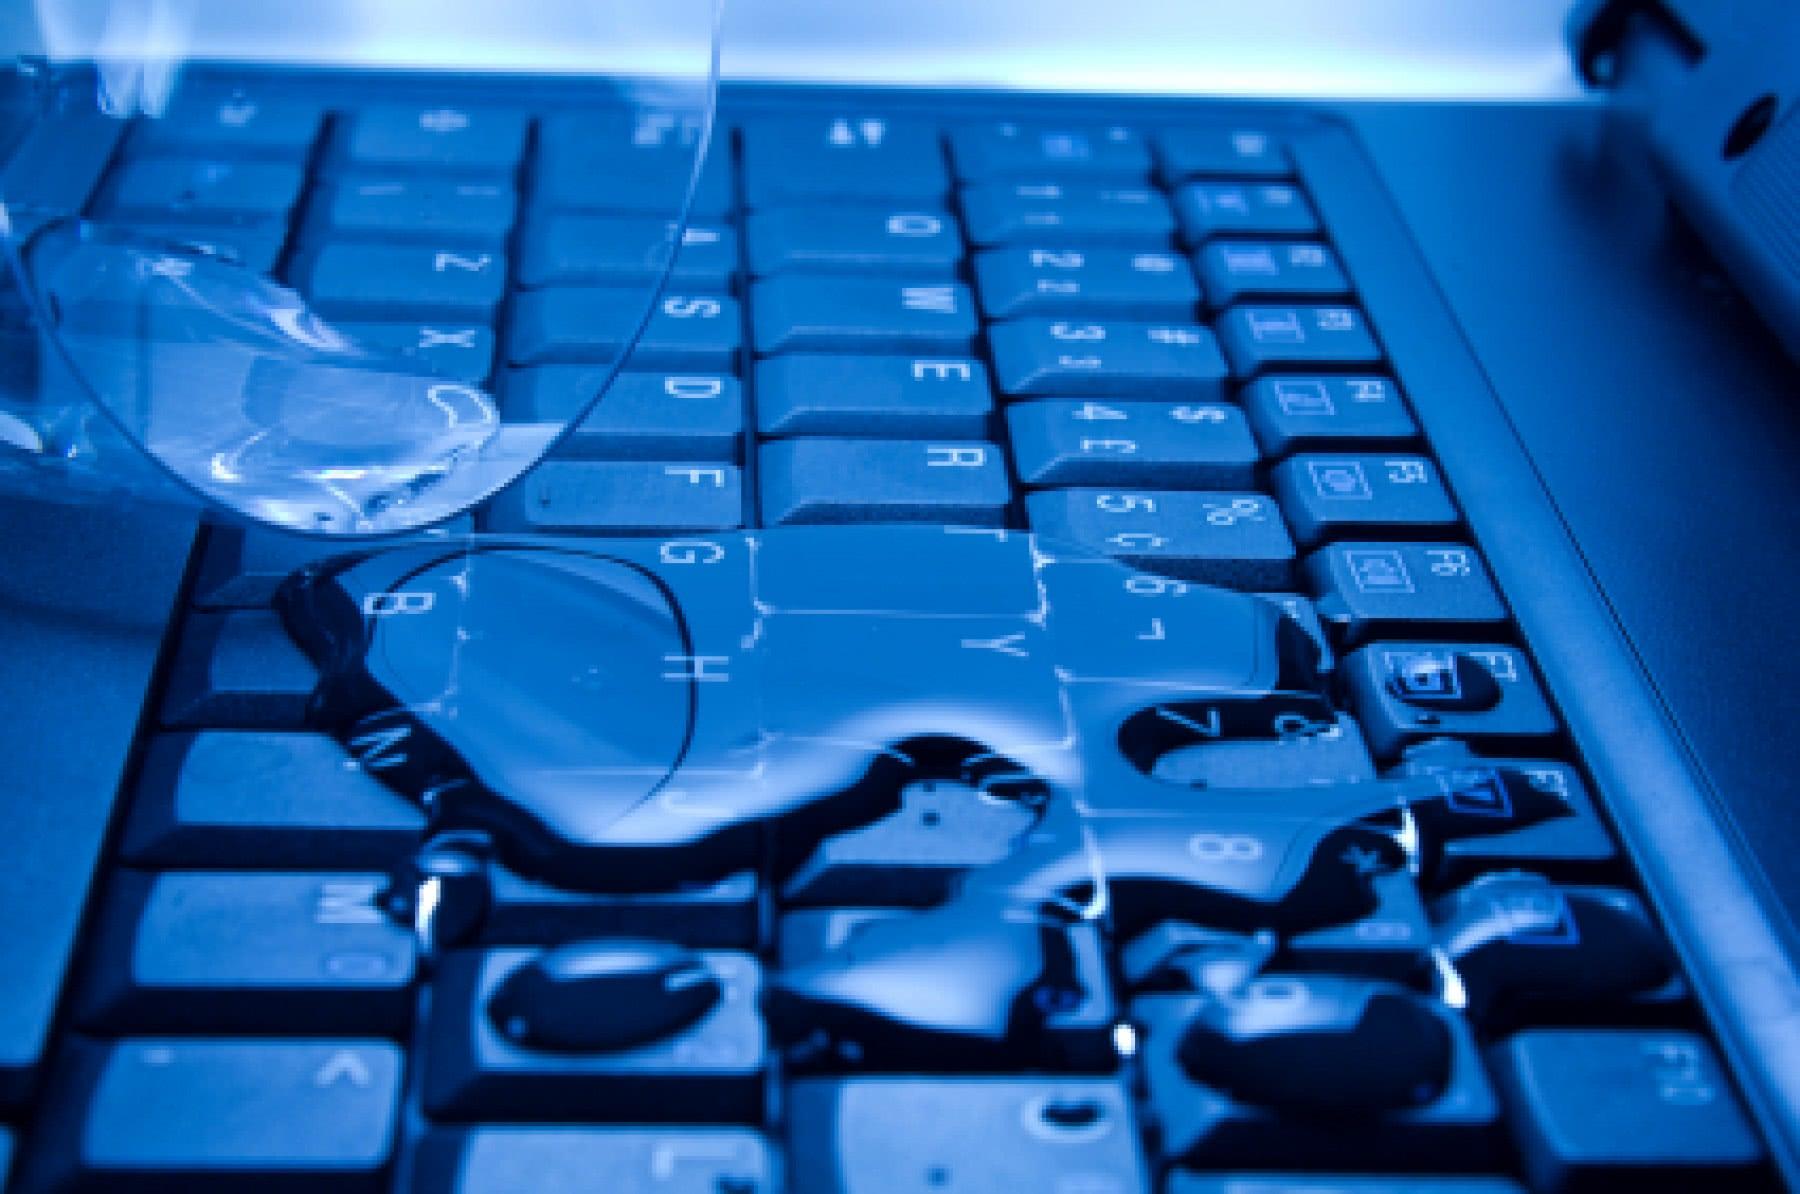 zalany komputer laptop